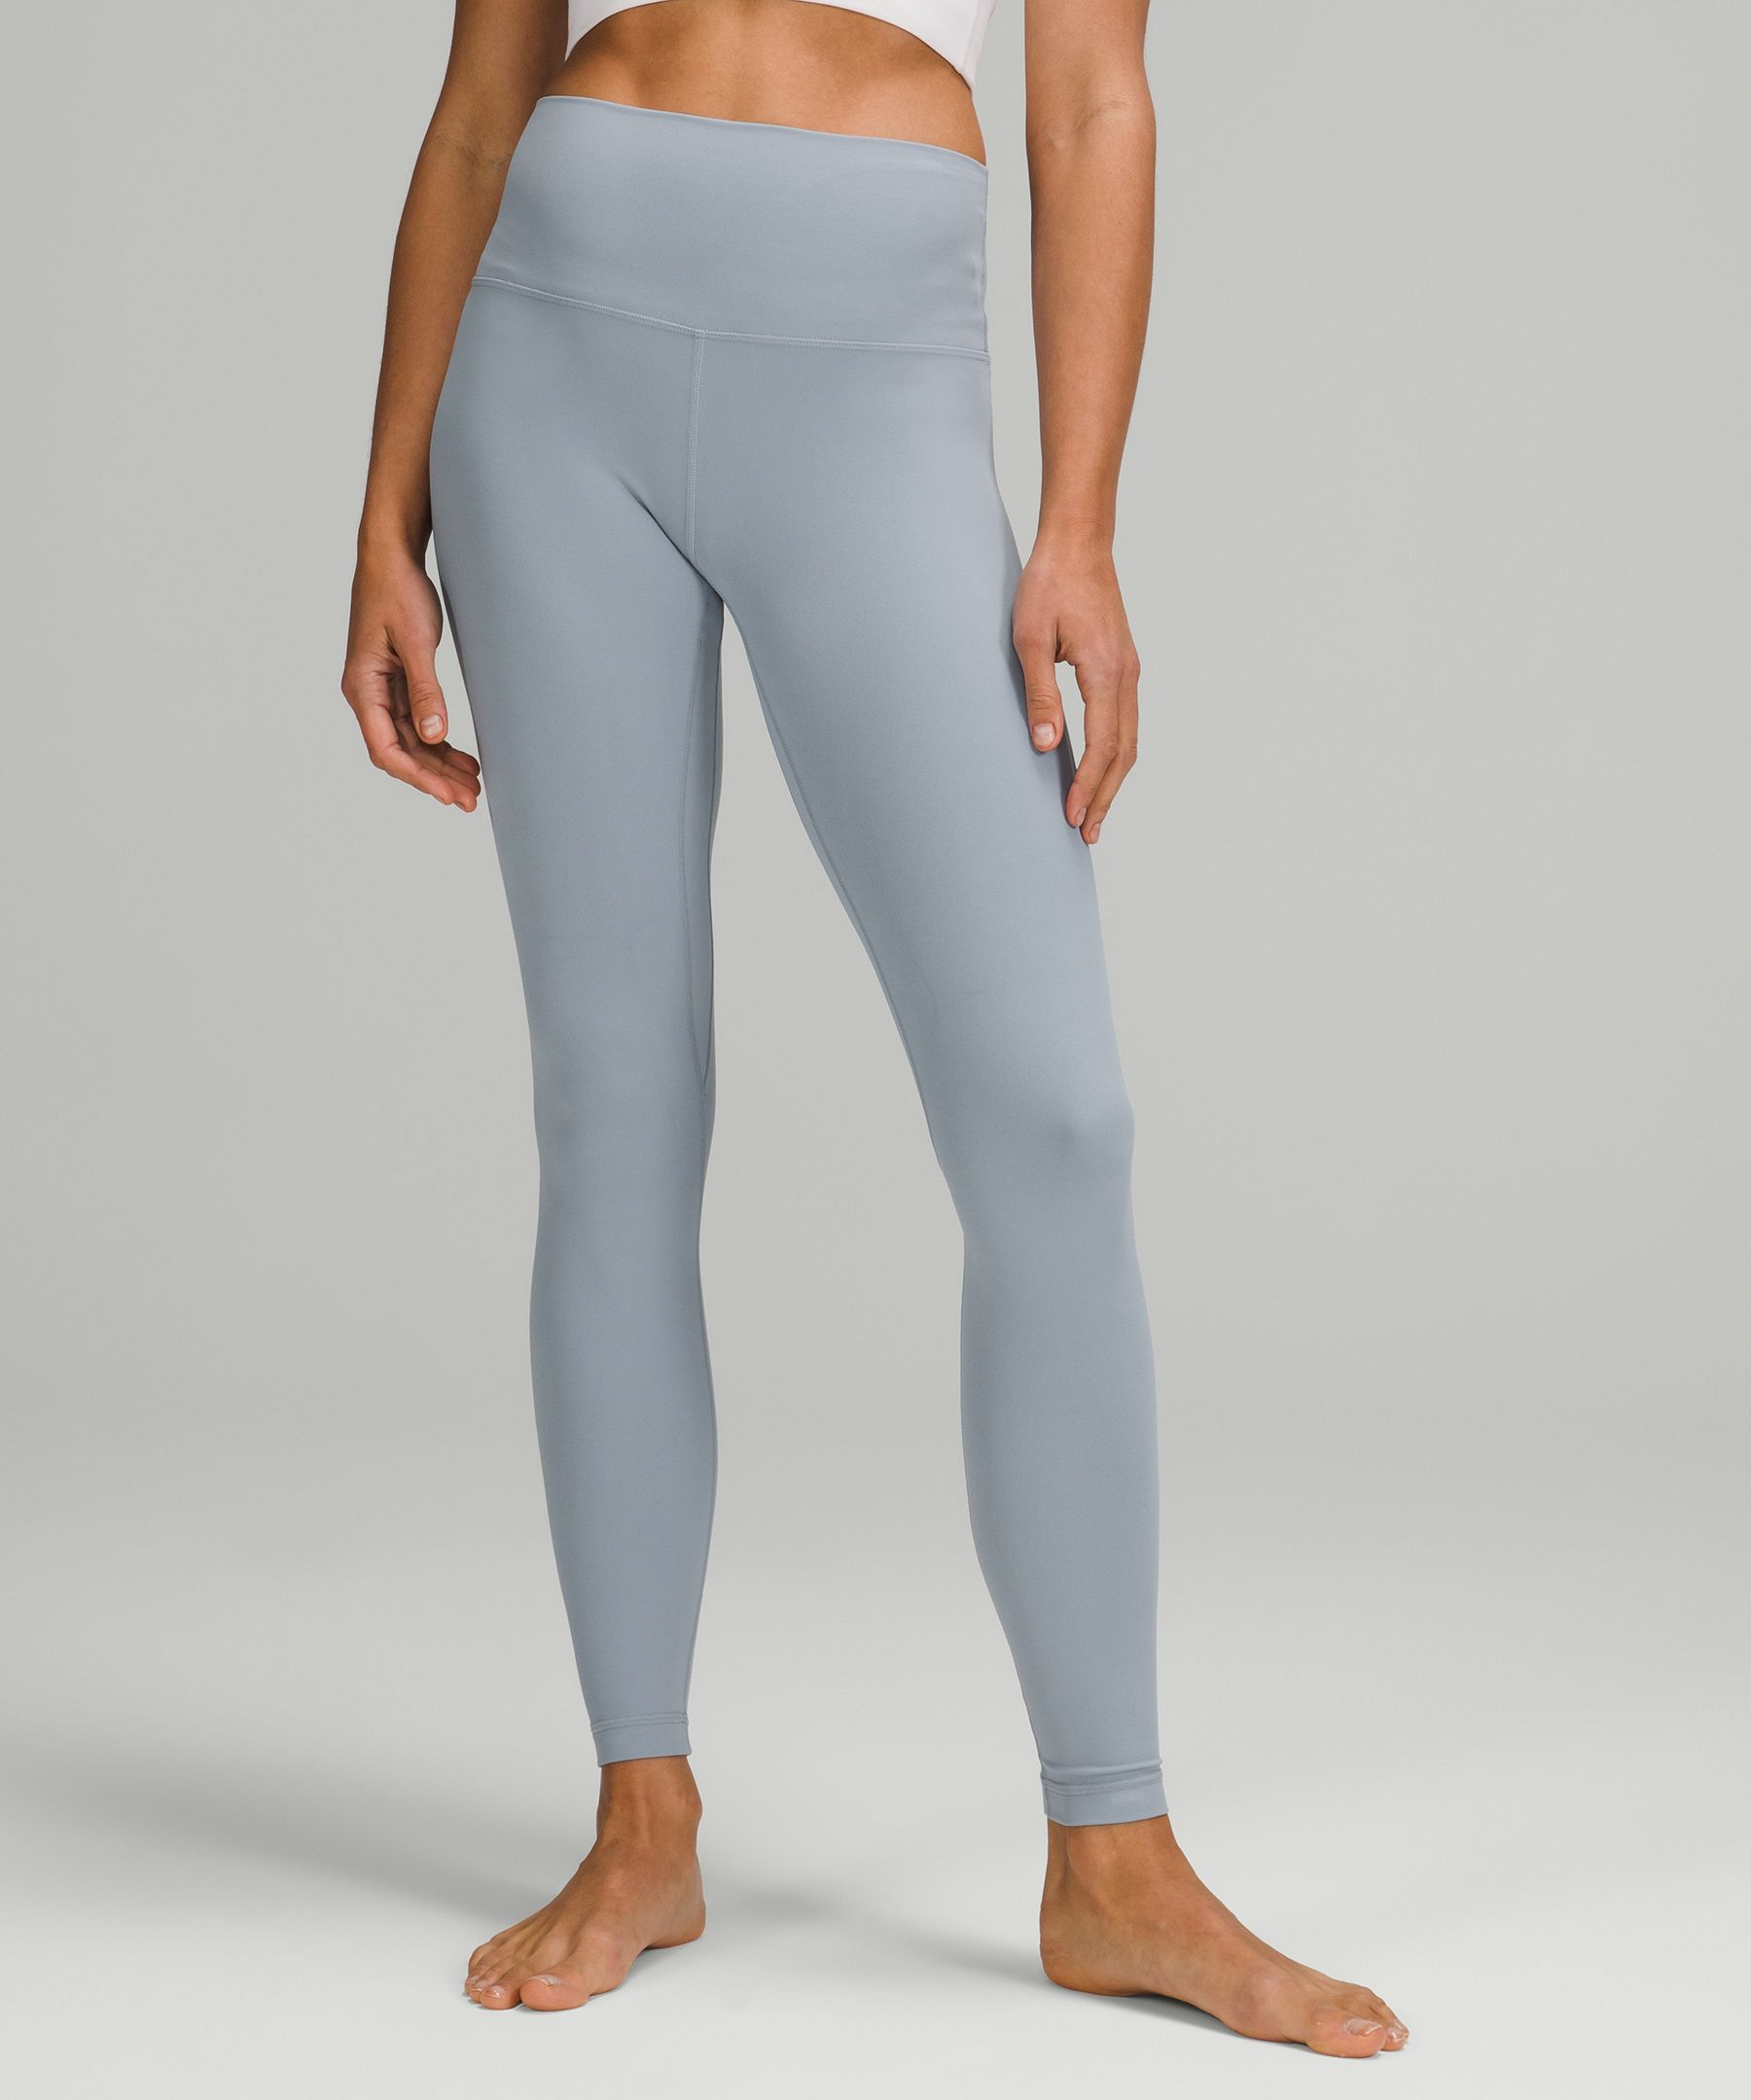 "Lululemon Align™ Pant Super High-rise 28"" In Blue"